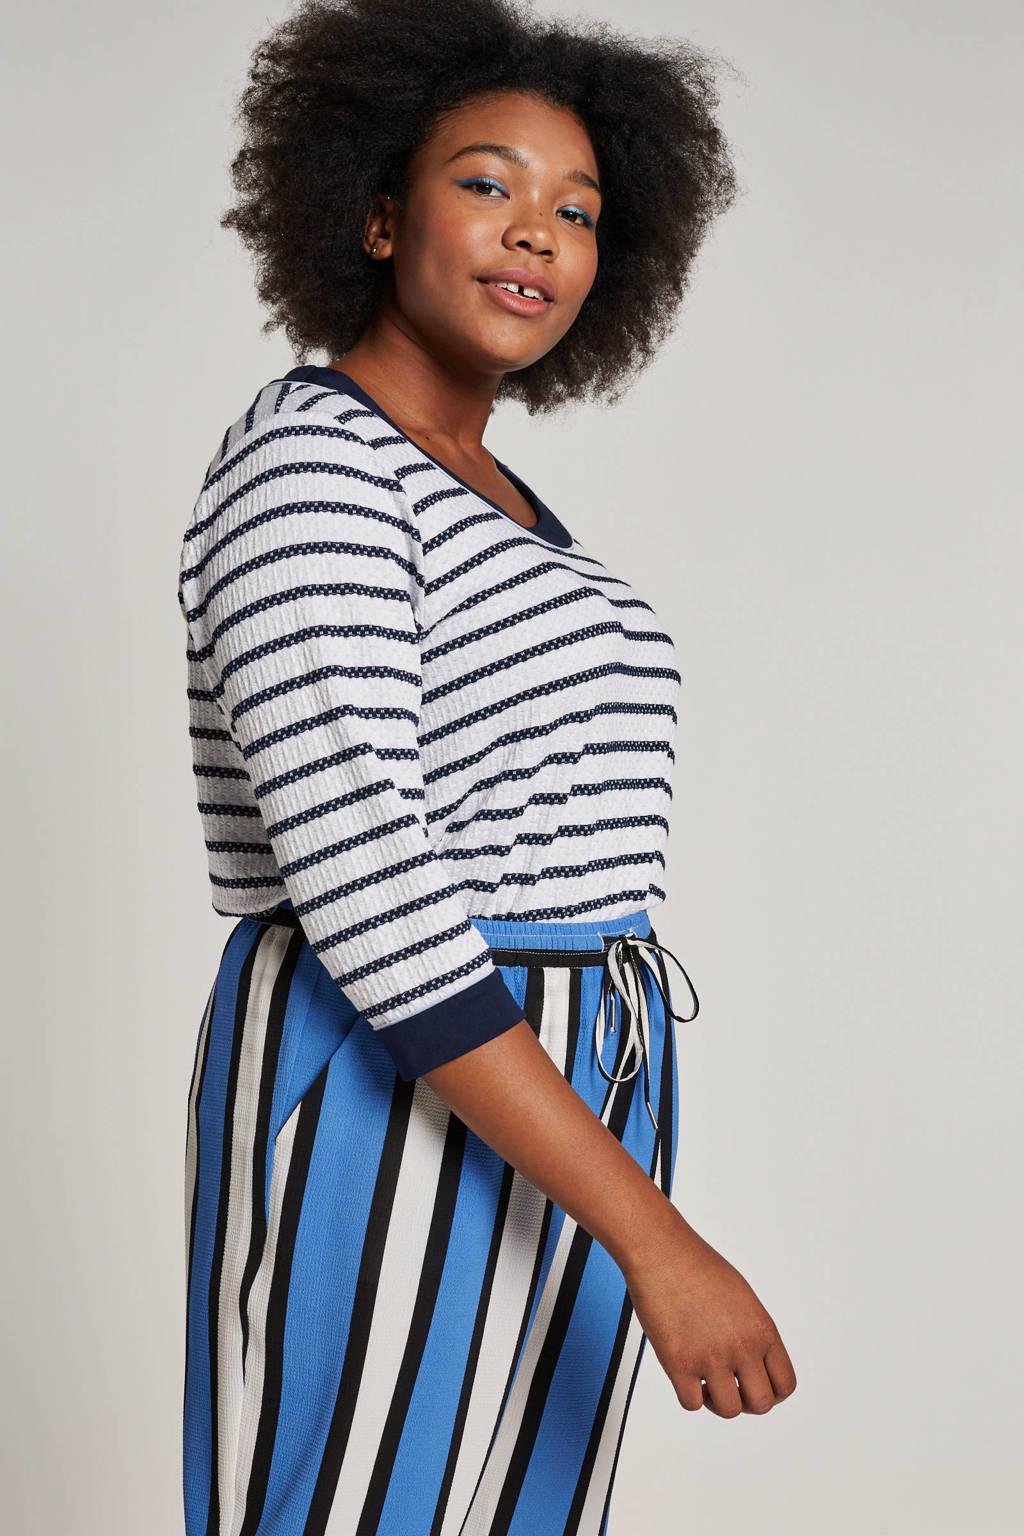 CHOISE t-shirt met strepen, Donkerblauw/wit